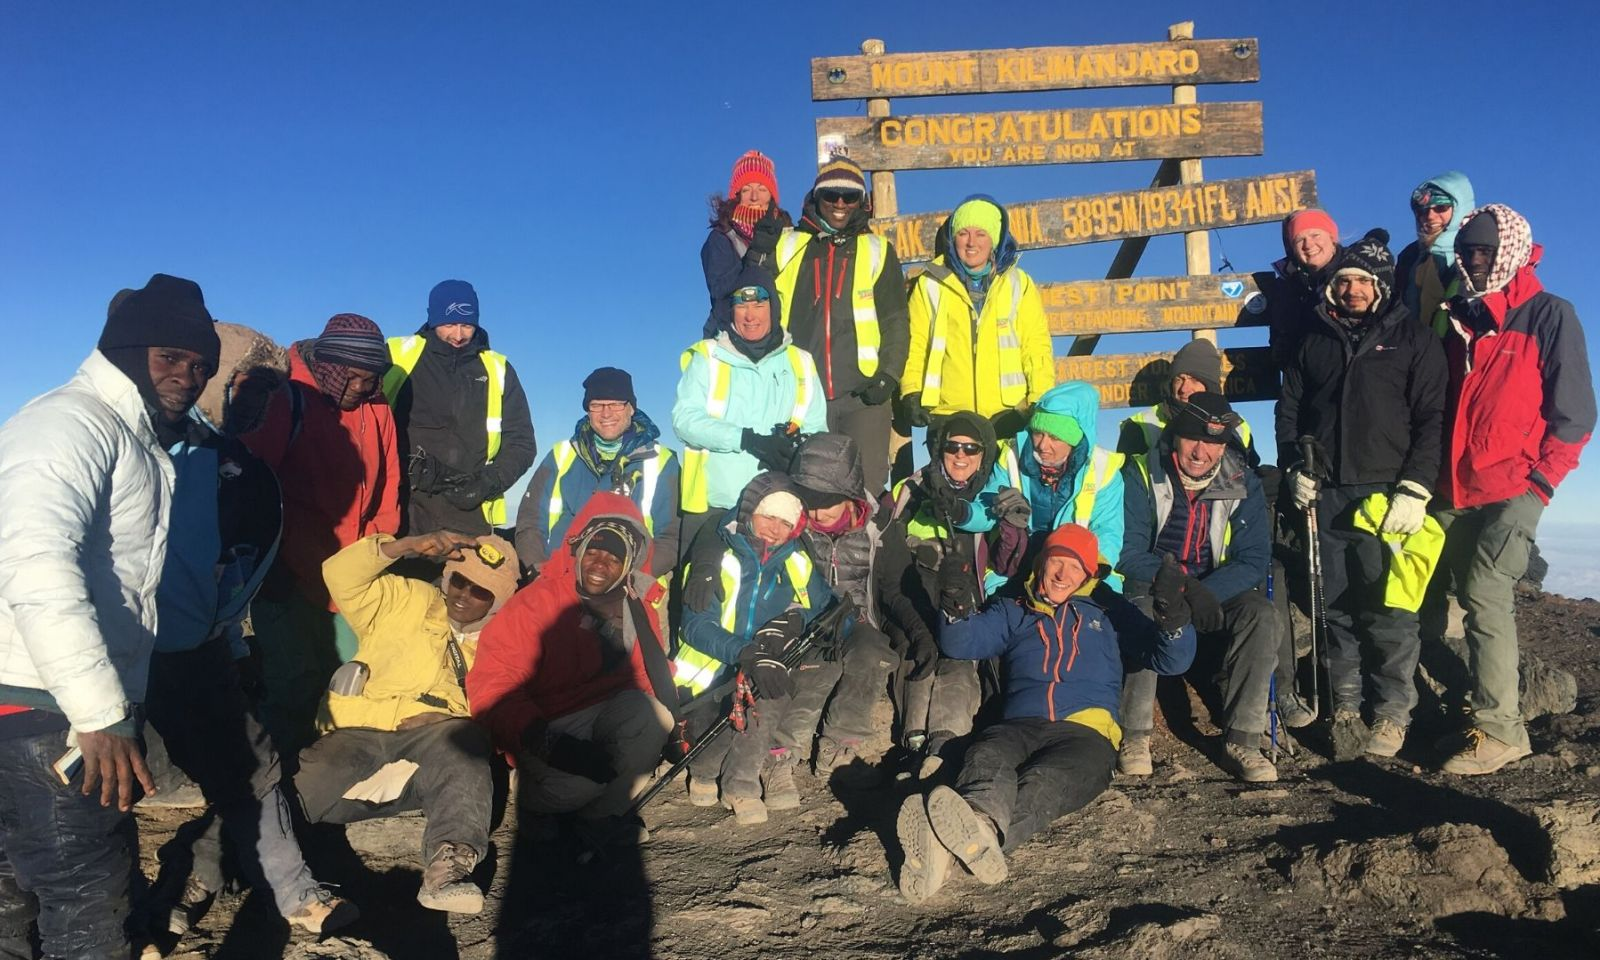 Group of trekkers standing on the summit of Kilimanjaro.